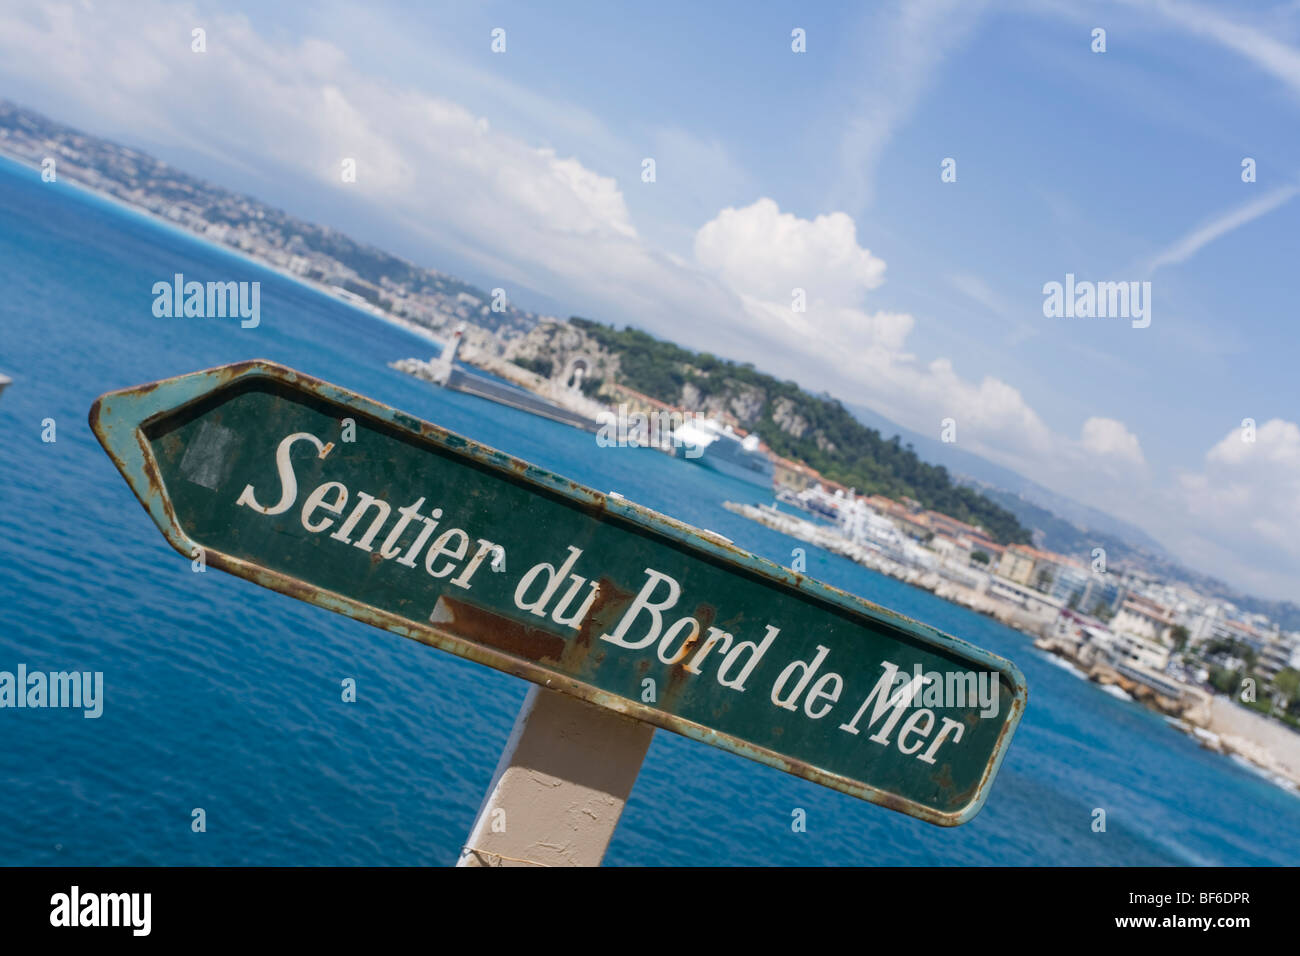 Sentier du Bord de Mer, Coastal Path, Sign, Nice Cote D Azur, Provence, France - Stock Image